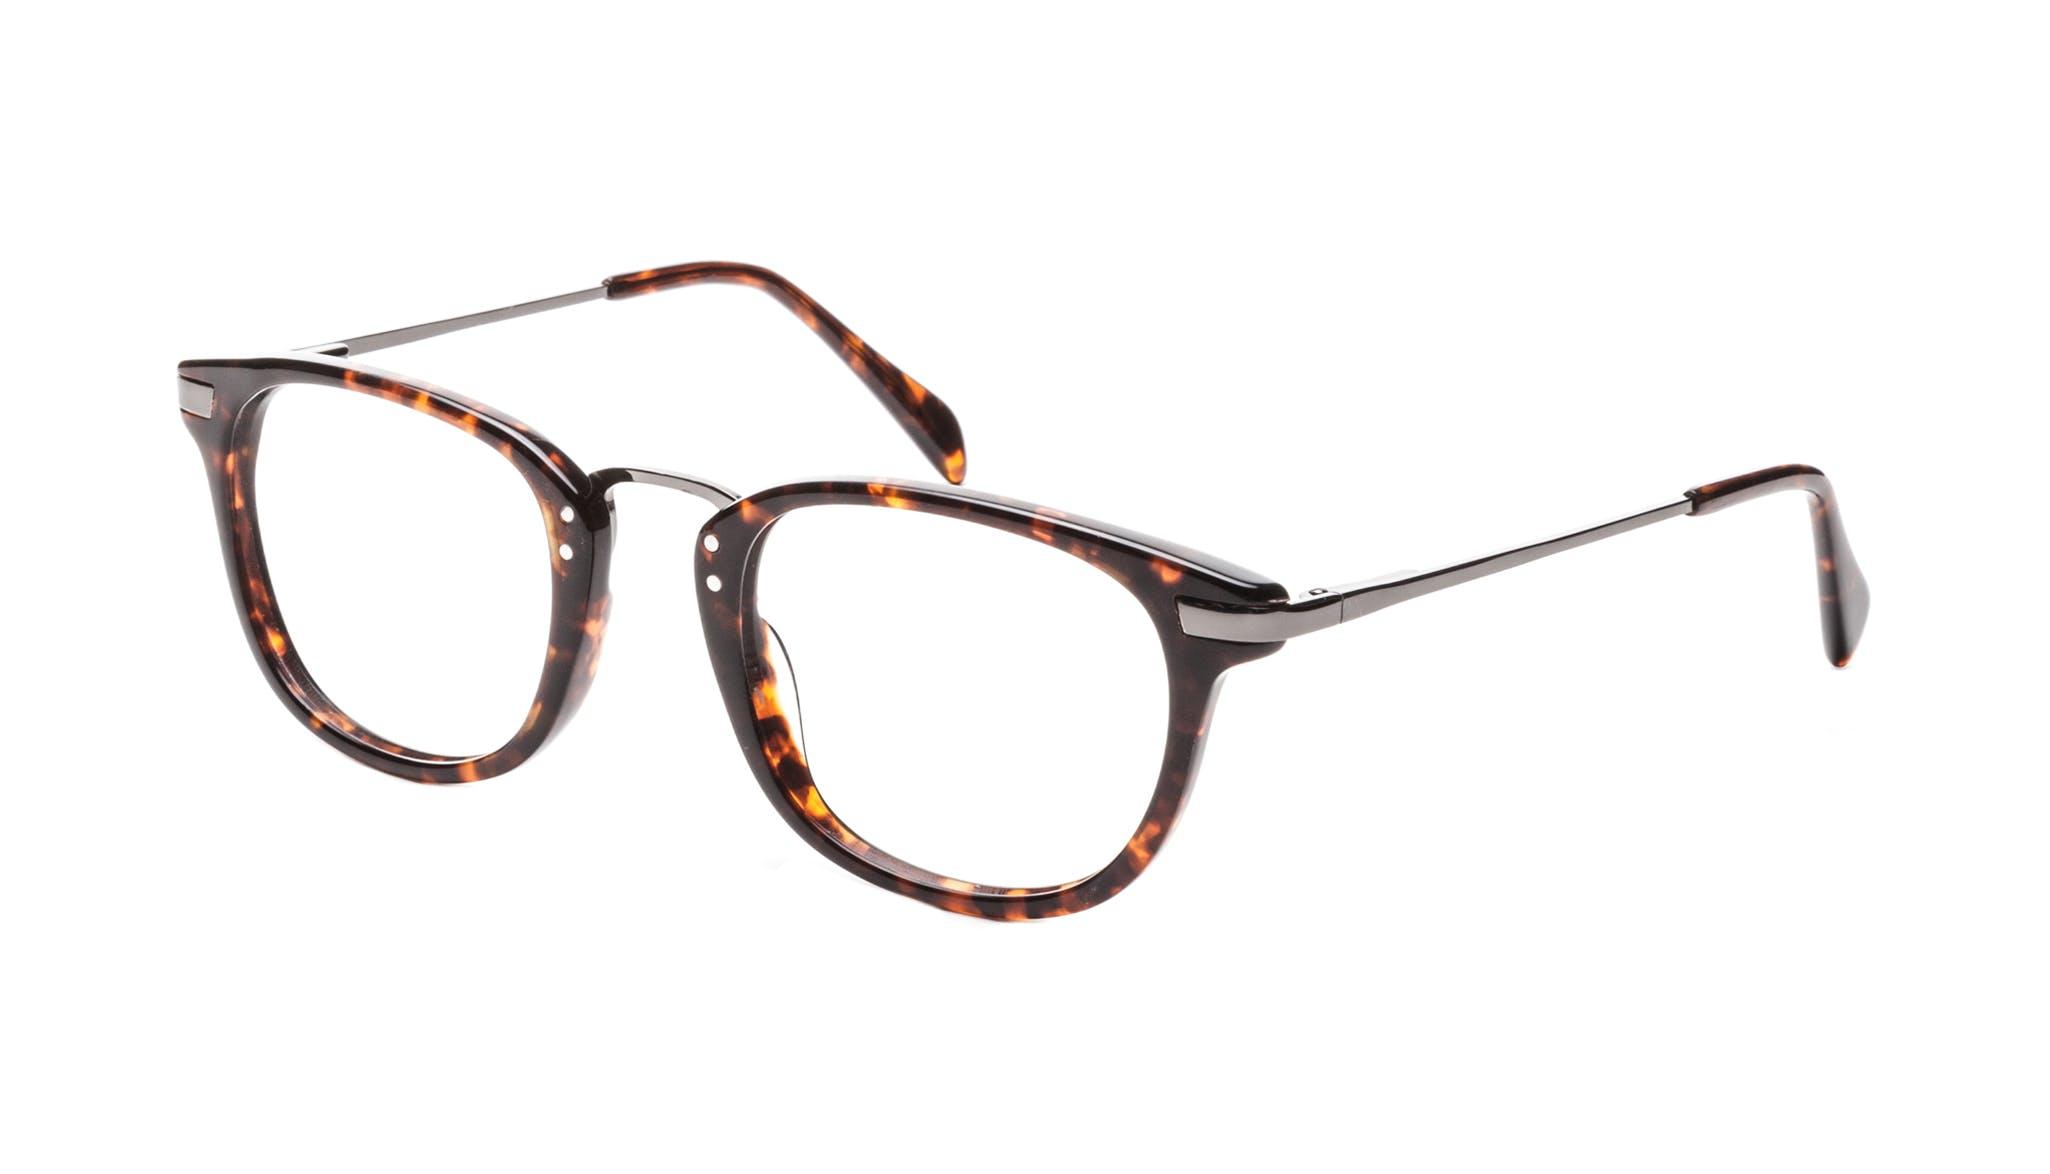 Affordable Fashion Glasses Rectangle Square Eyeglasses Men Daze Sepia Tilt